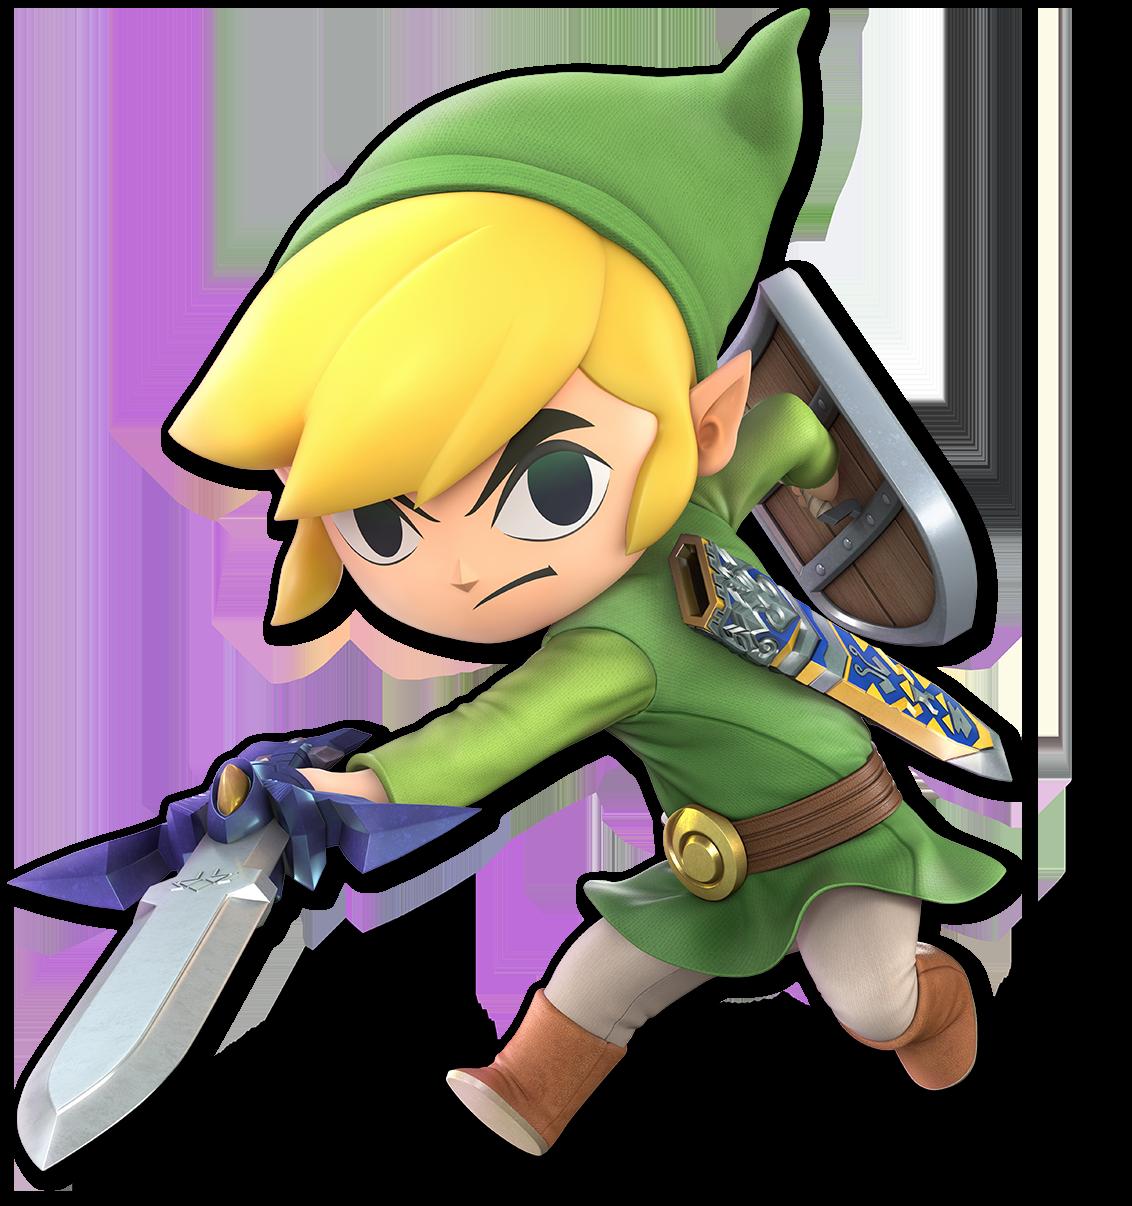 Toon Link as he appears in Super Smash Bros  Ultimate